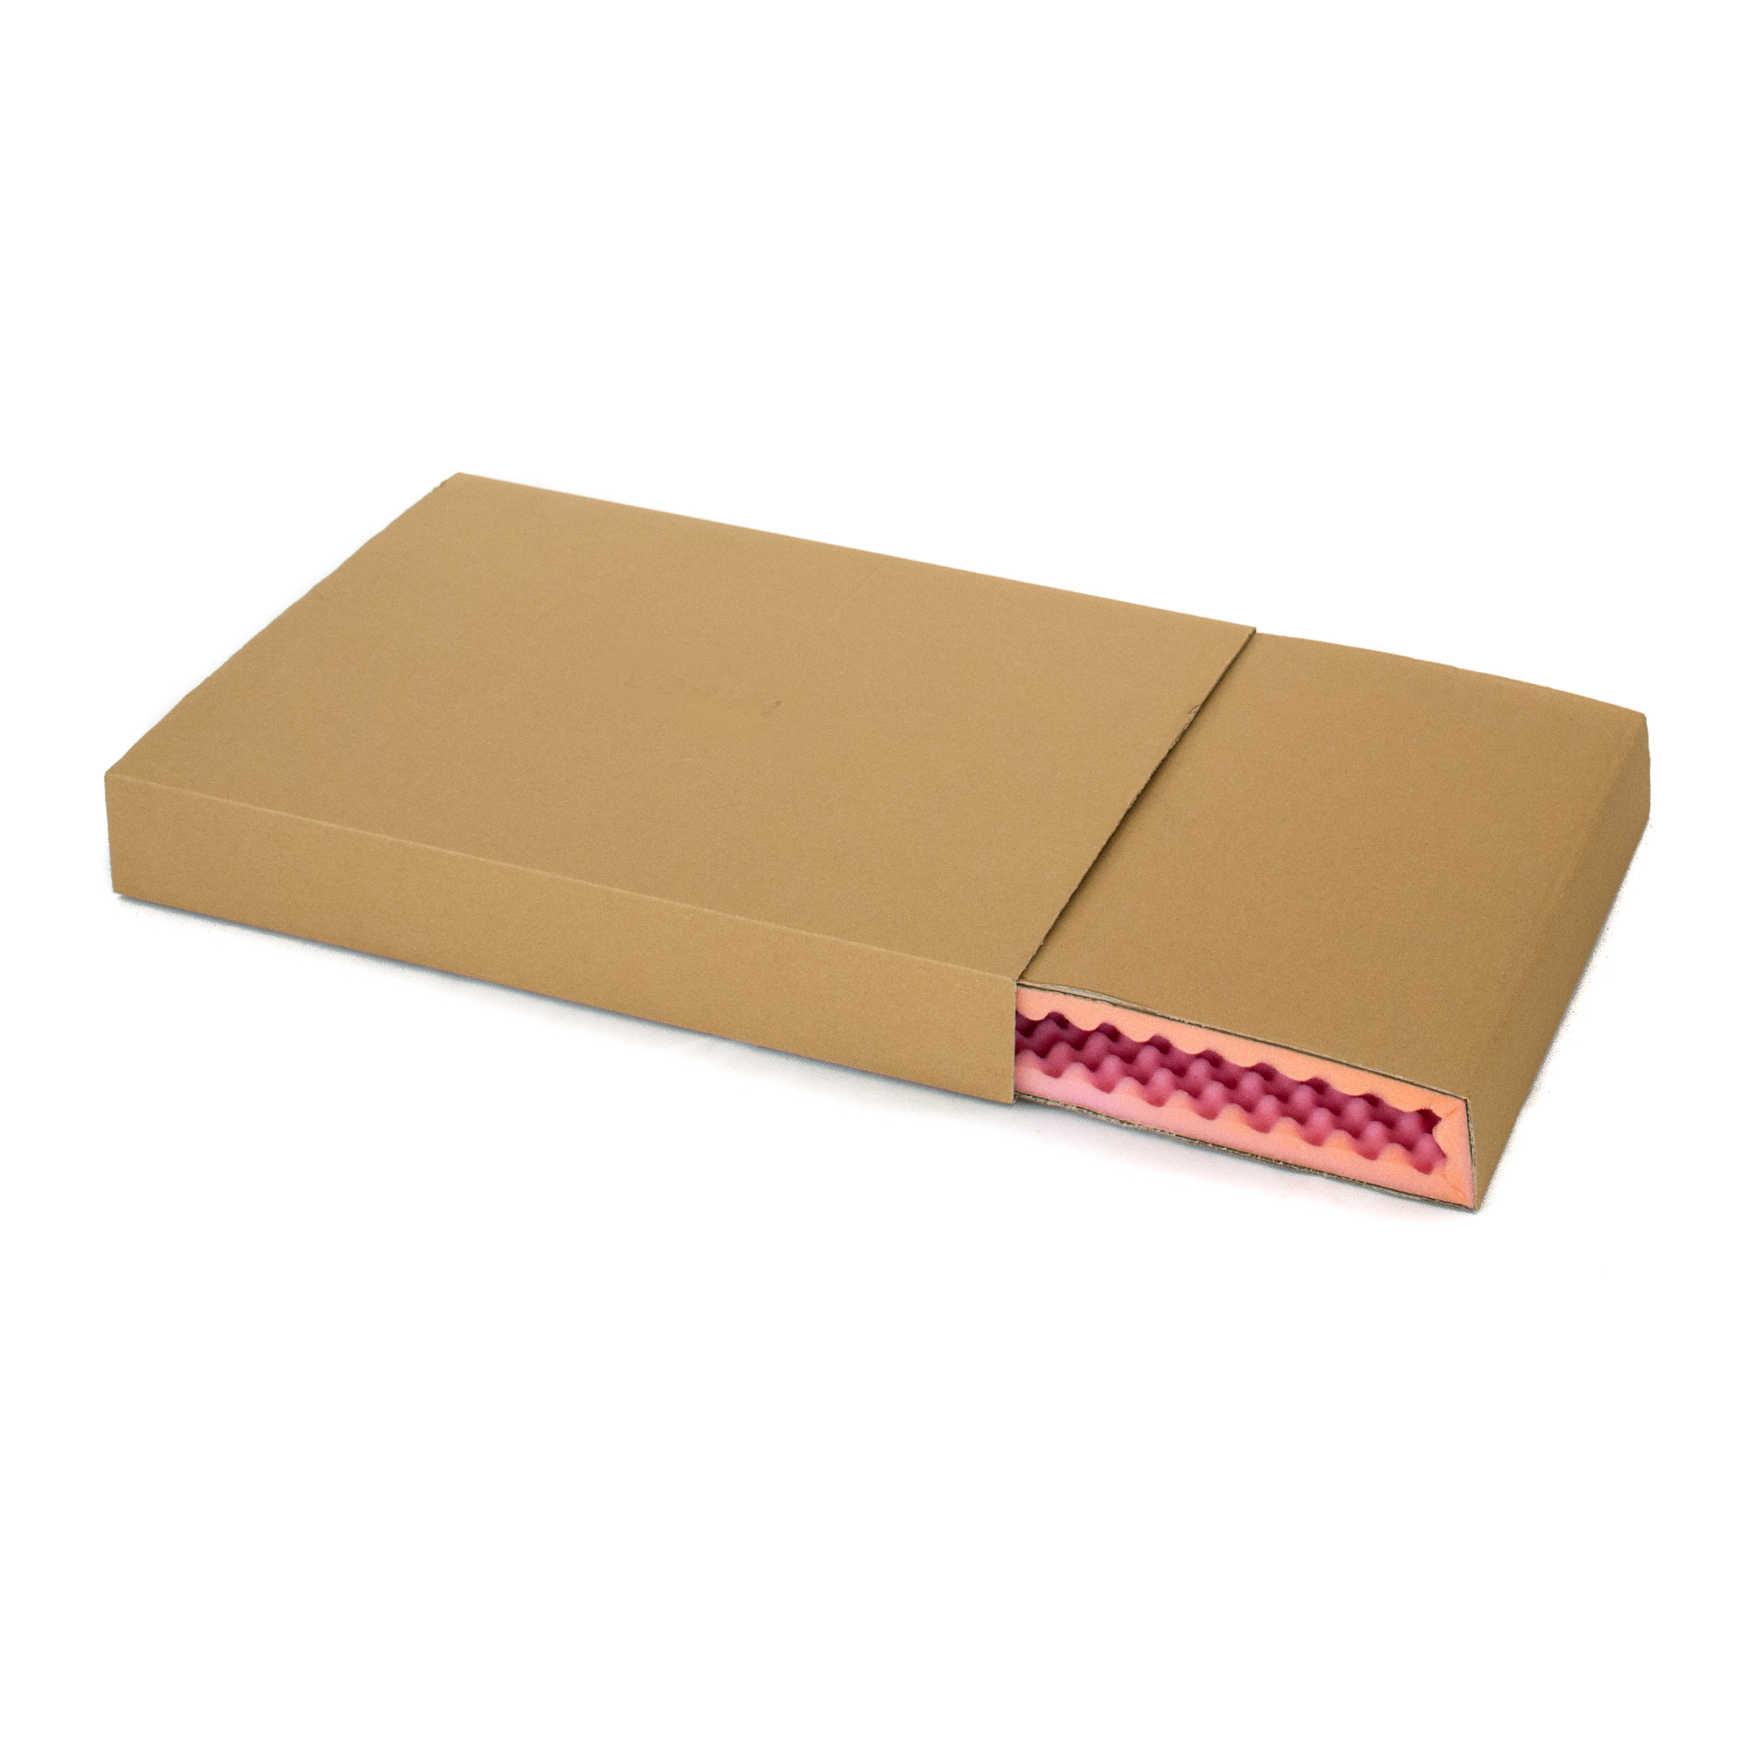 Polsterkartons